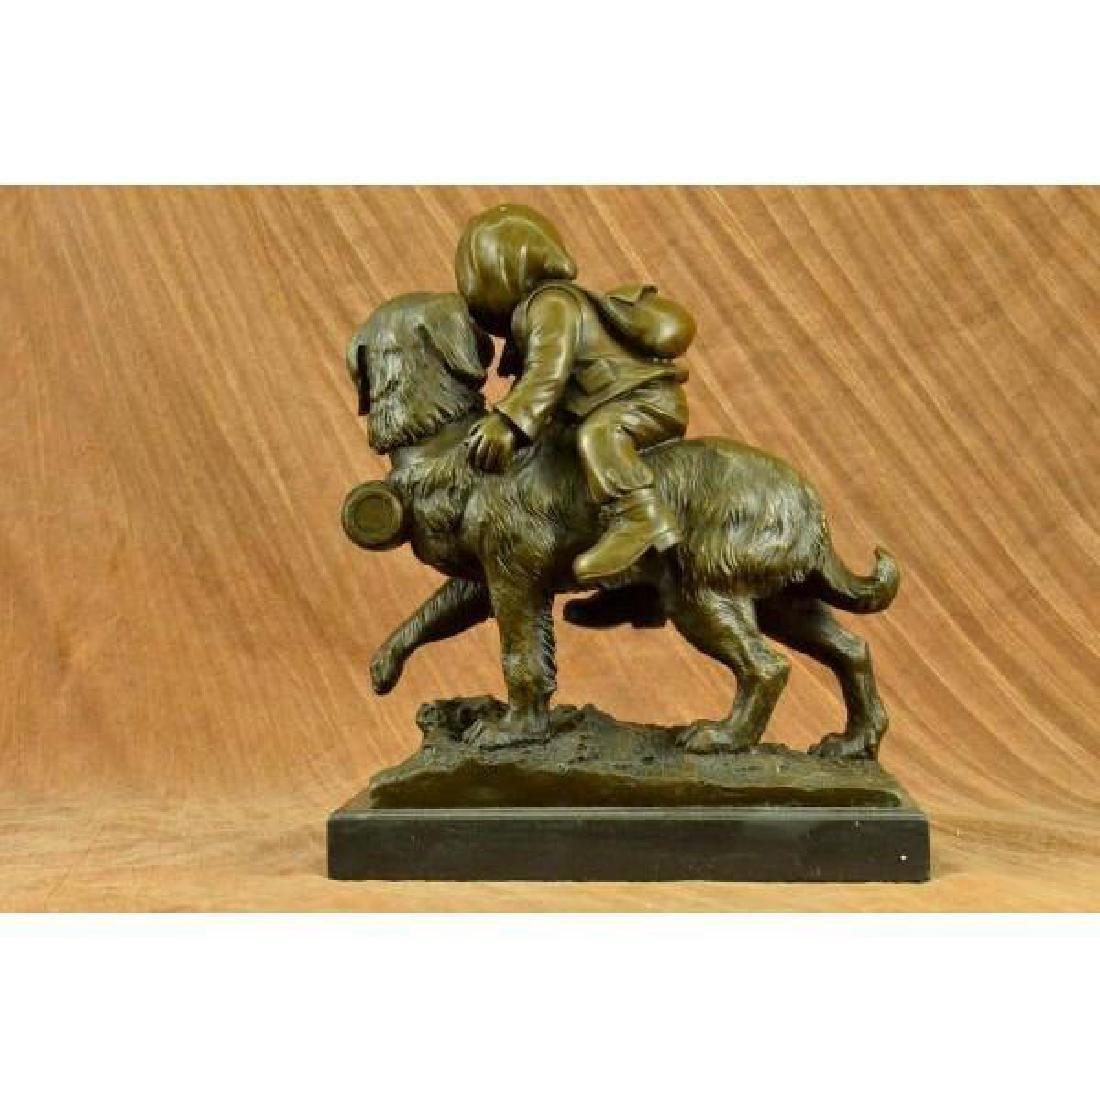 Chien Du St. Bernard by Guadez French Artist Bronze